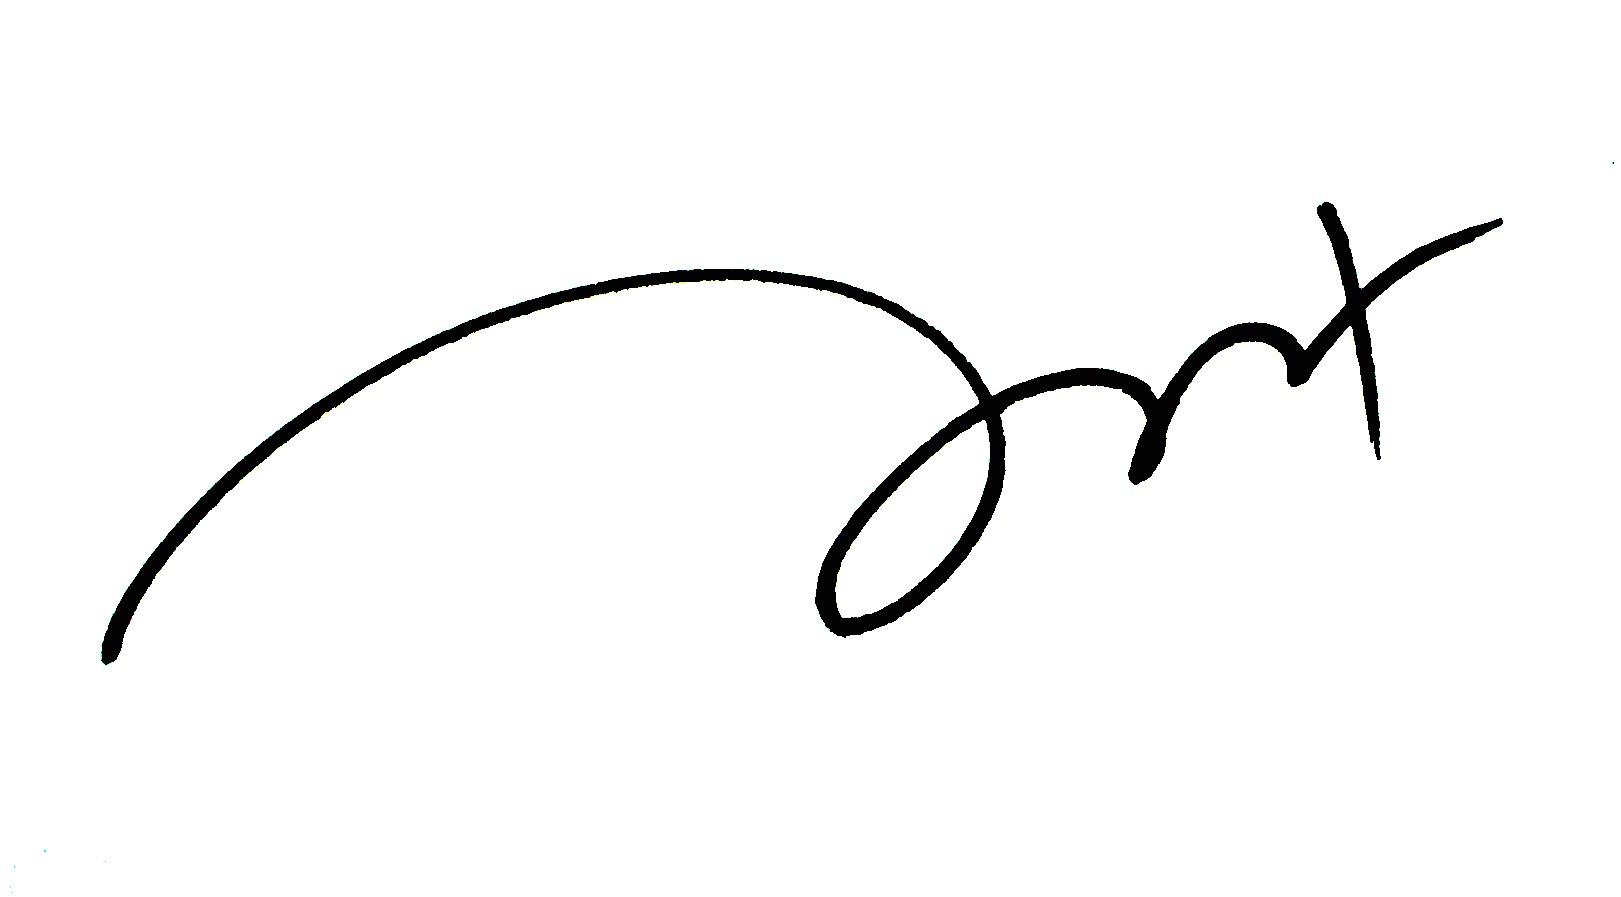 Amrit Singh Sandhu Signature